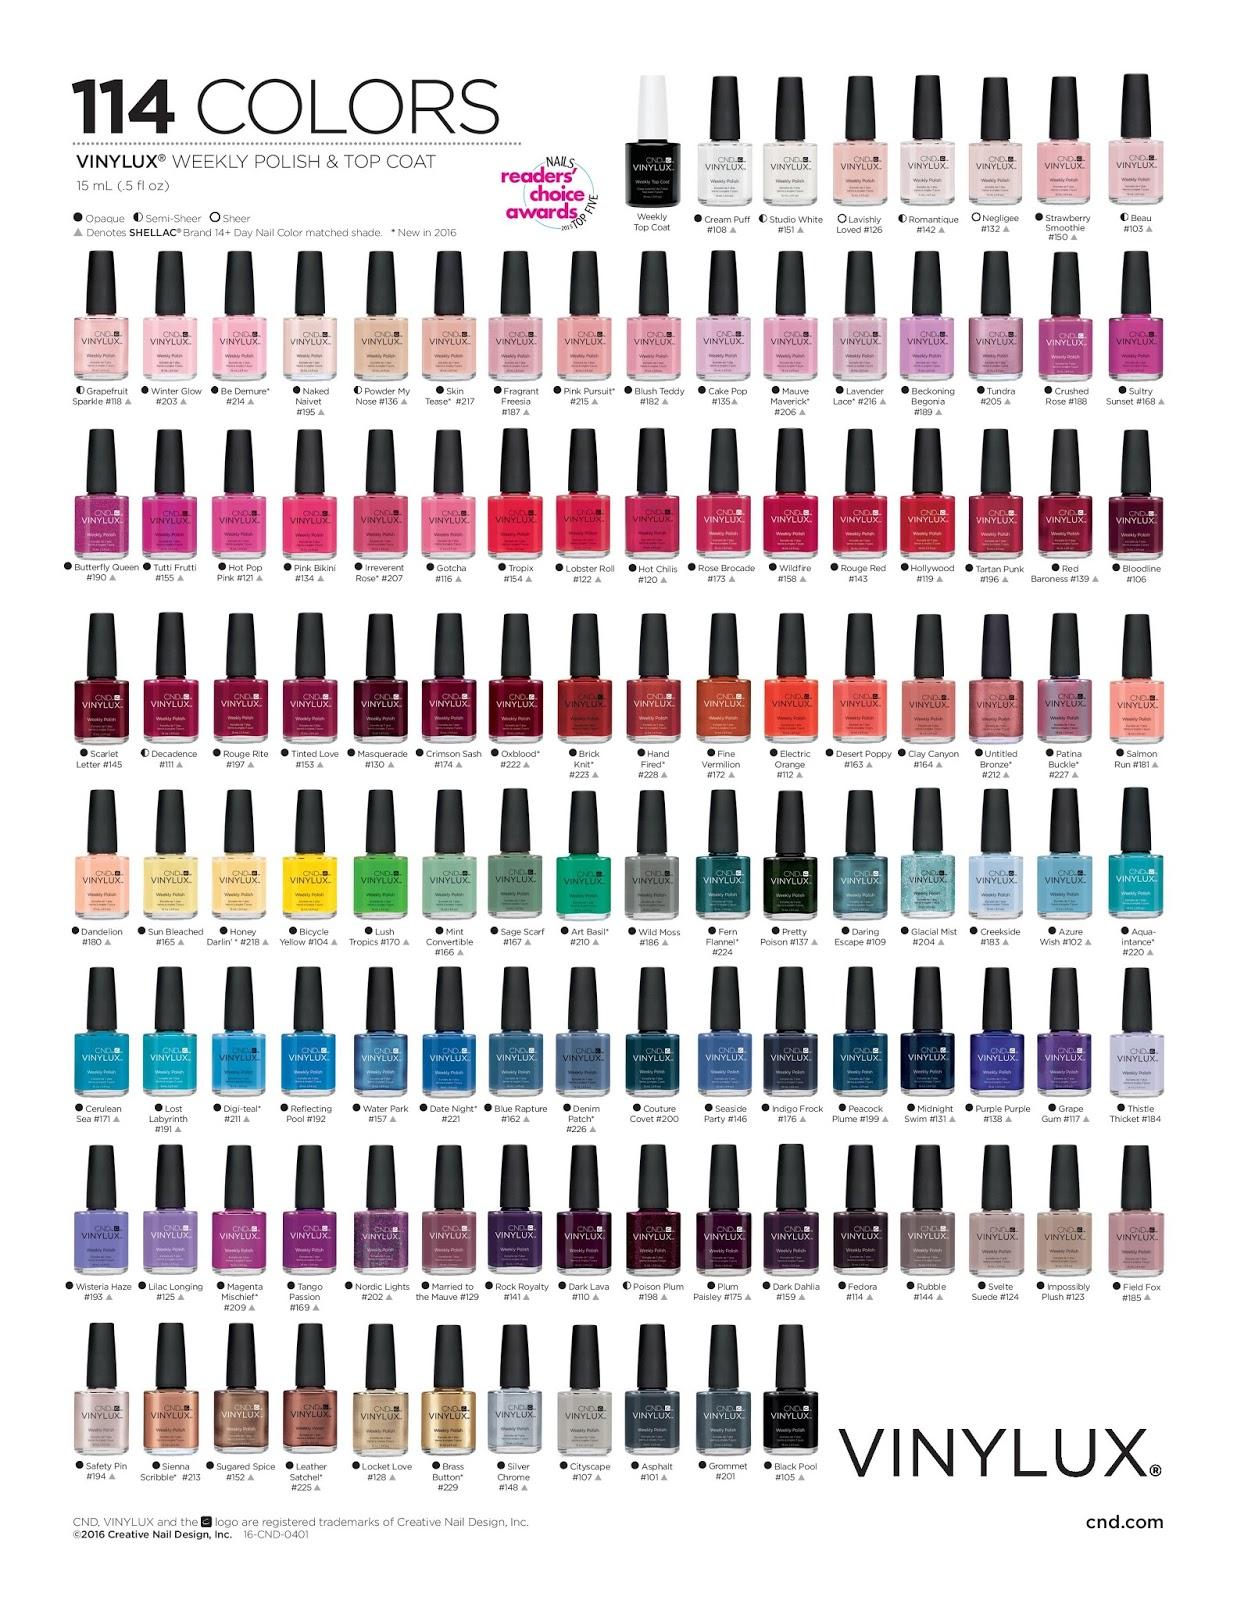 Similiar Creative Nail Design Vinylux Colorlist Keywords